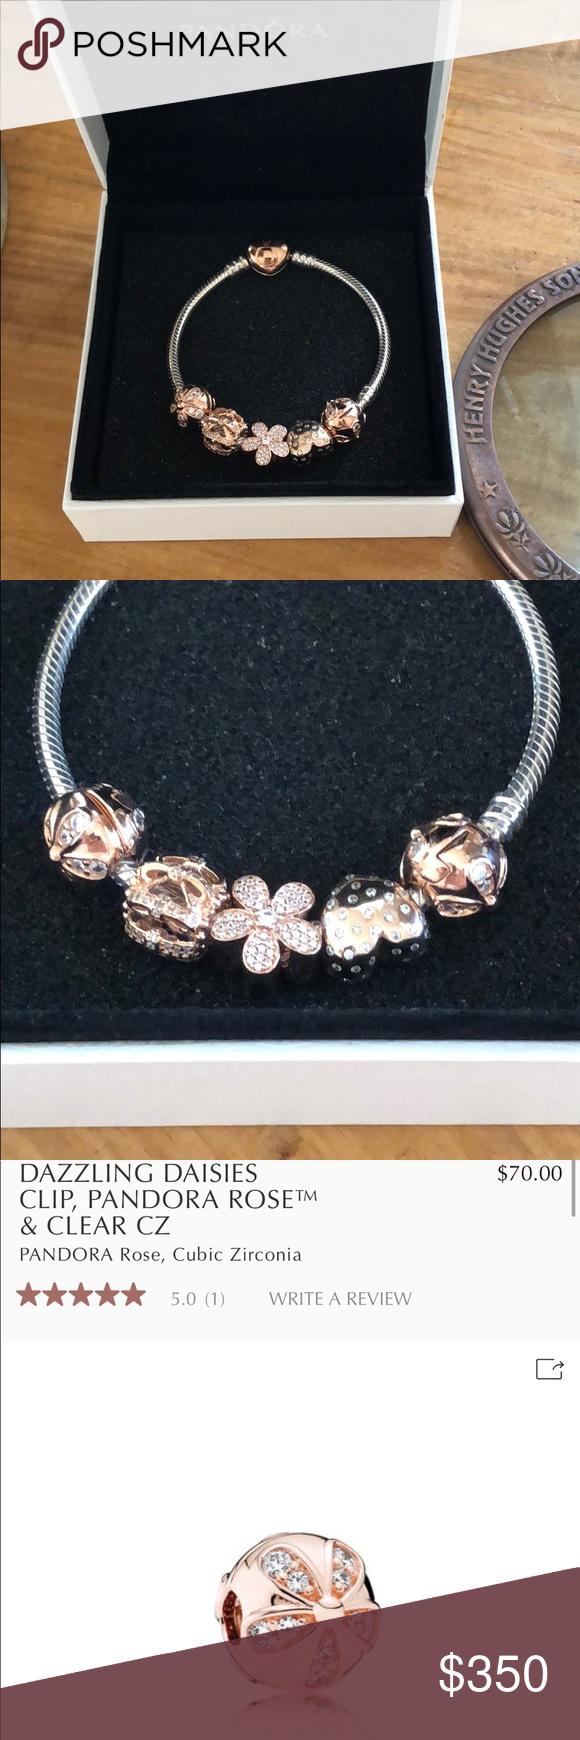 Pandora rose gold bracelet with charms in my posh closet